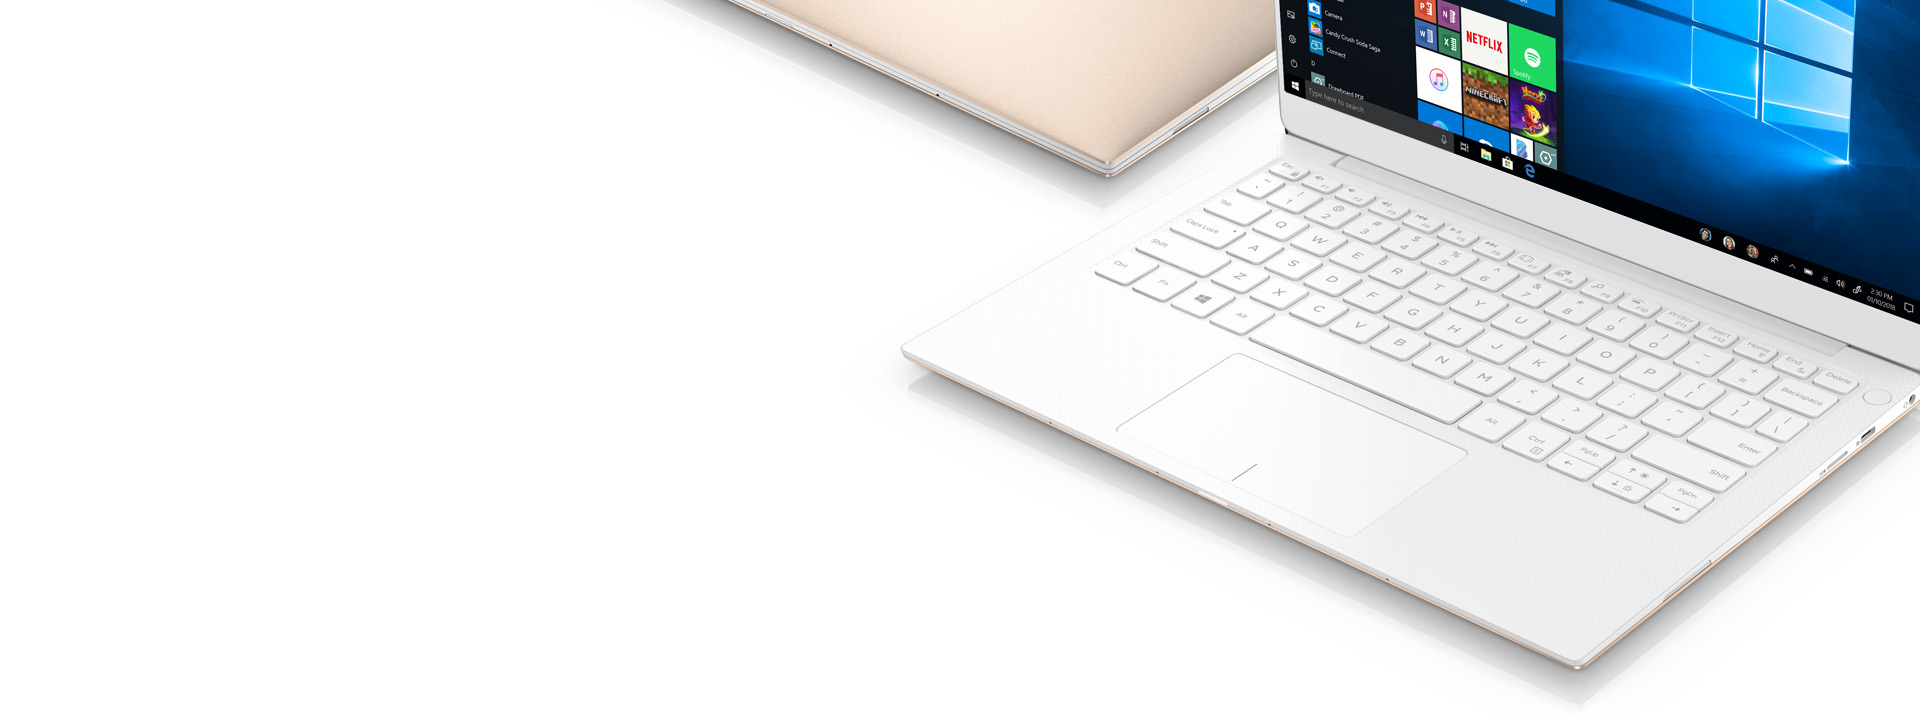 Windows 10 手提電腦顯示開始畫面